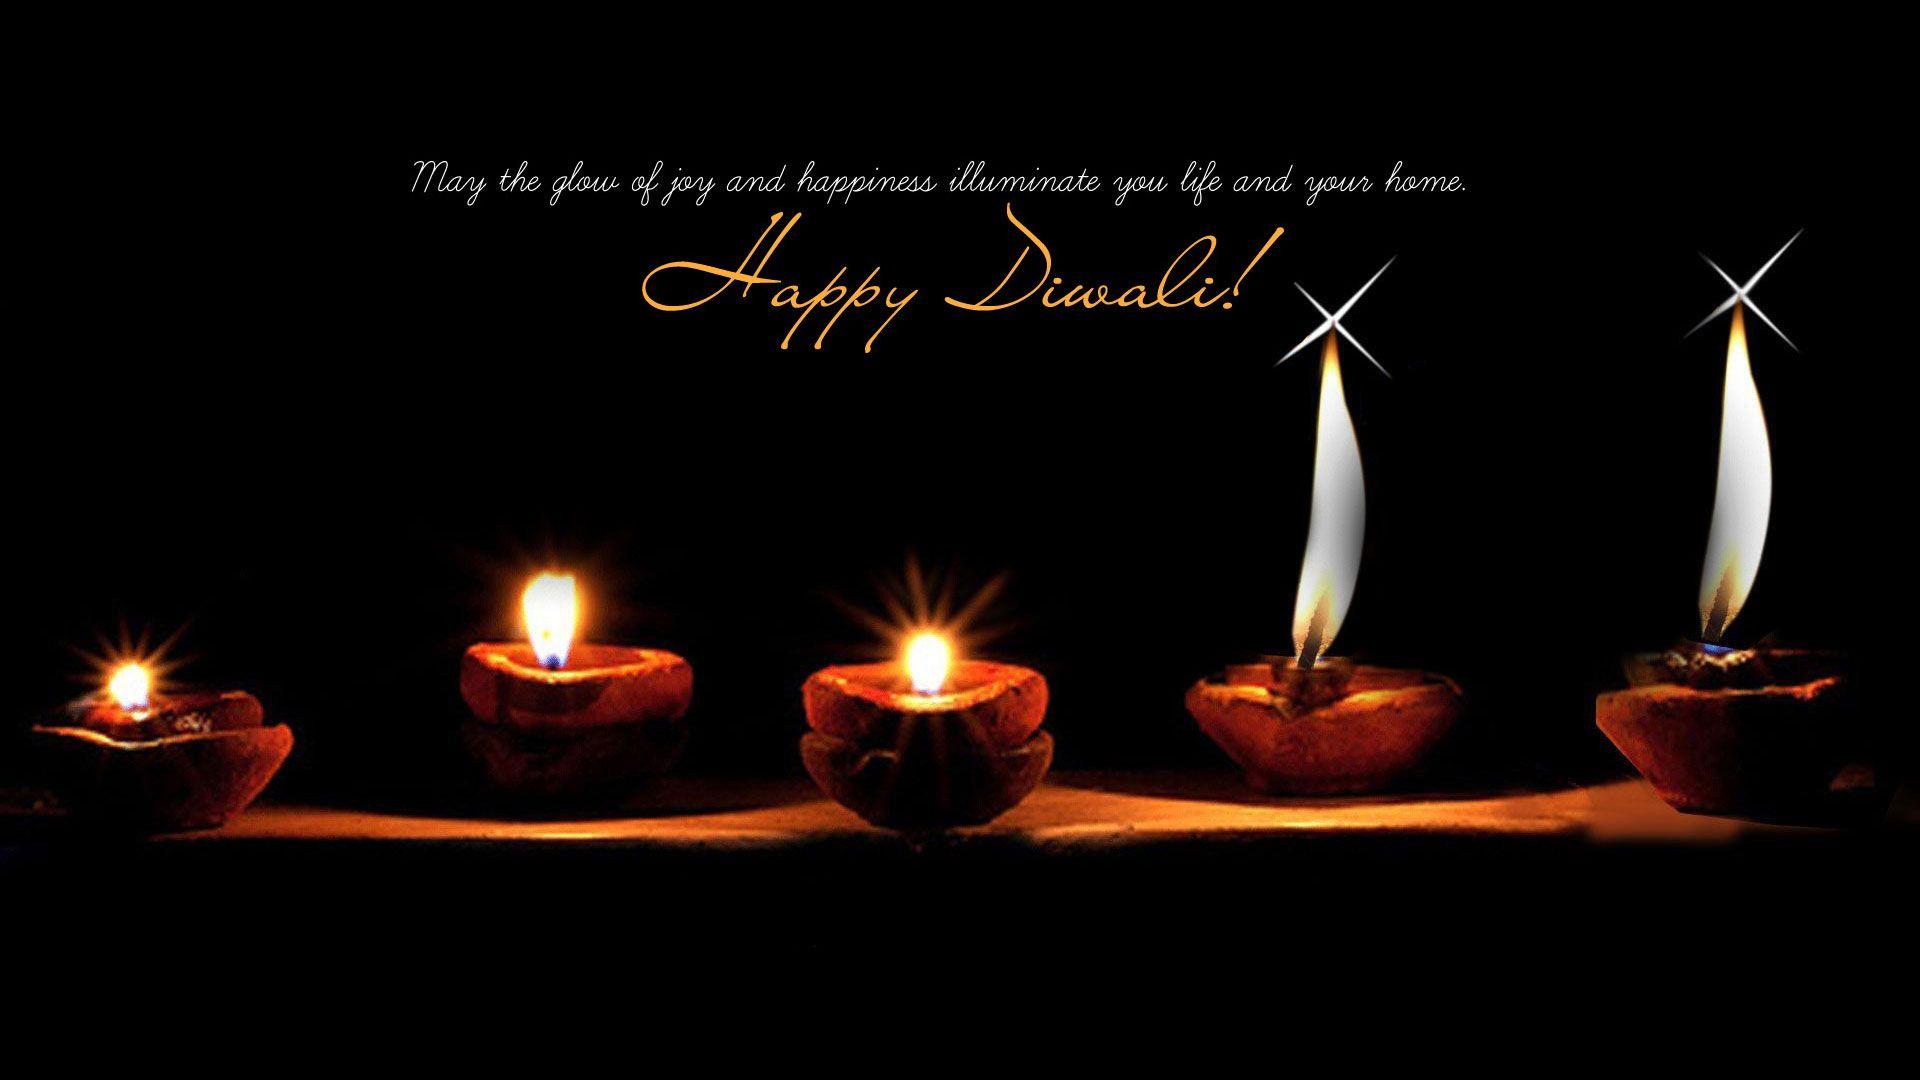 Happy Diwali Wallpaper HD Widescreen Download | Diwali Wallpapers ... for Happy Deepavali Wallpaper Hd Widescreen  58cpg